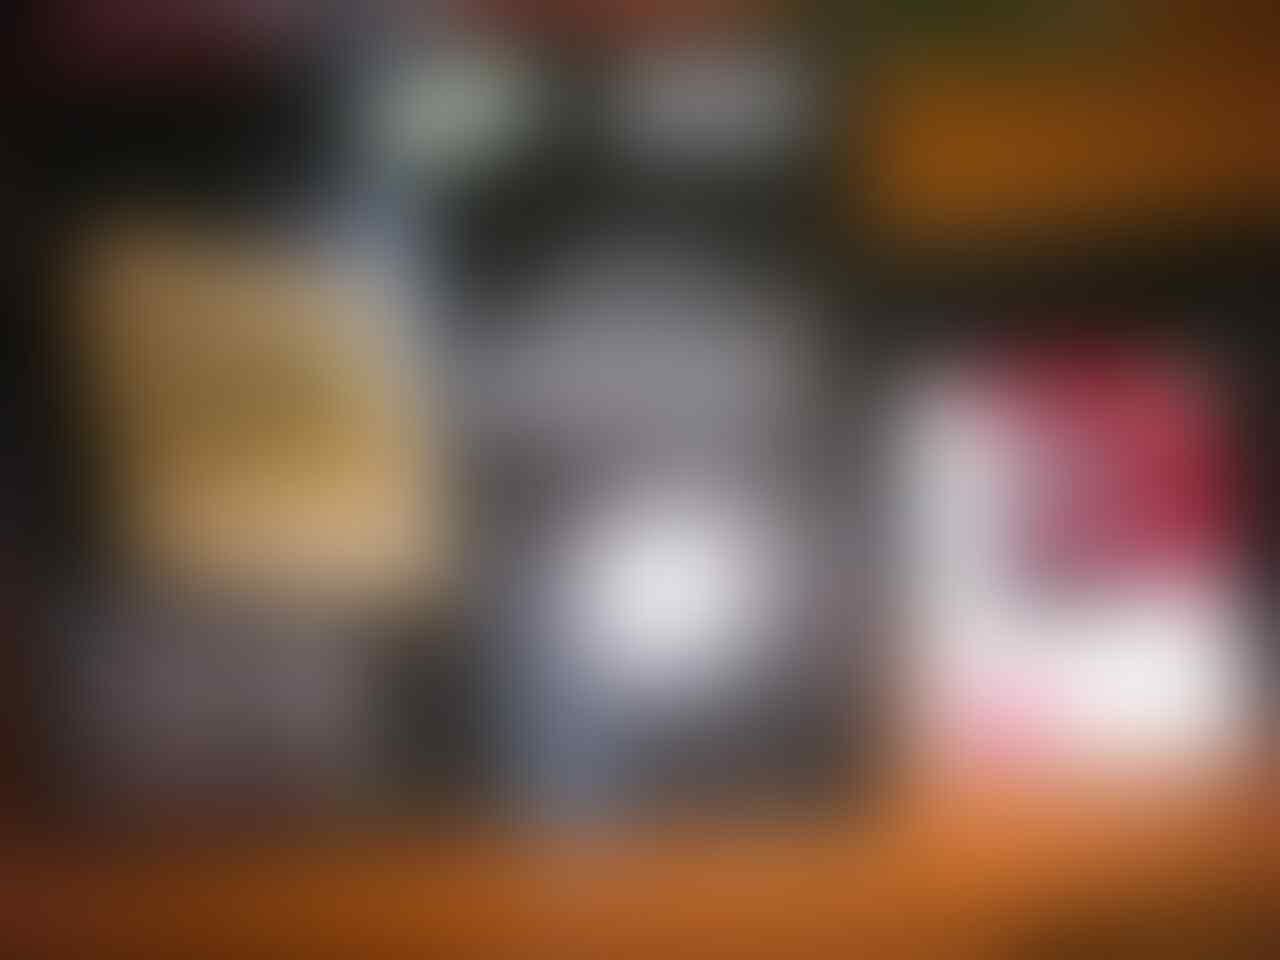 Pembelian PART PC di MANGGA DUA MALL simple DAN aman JABODETABEK